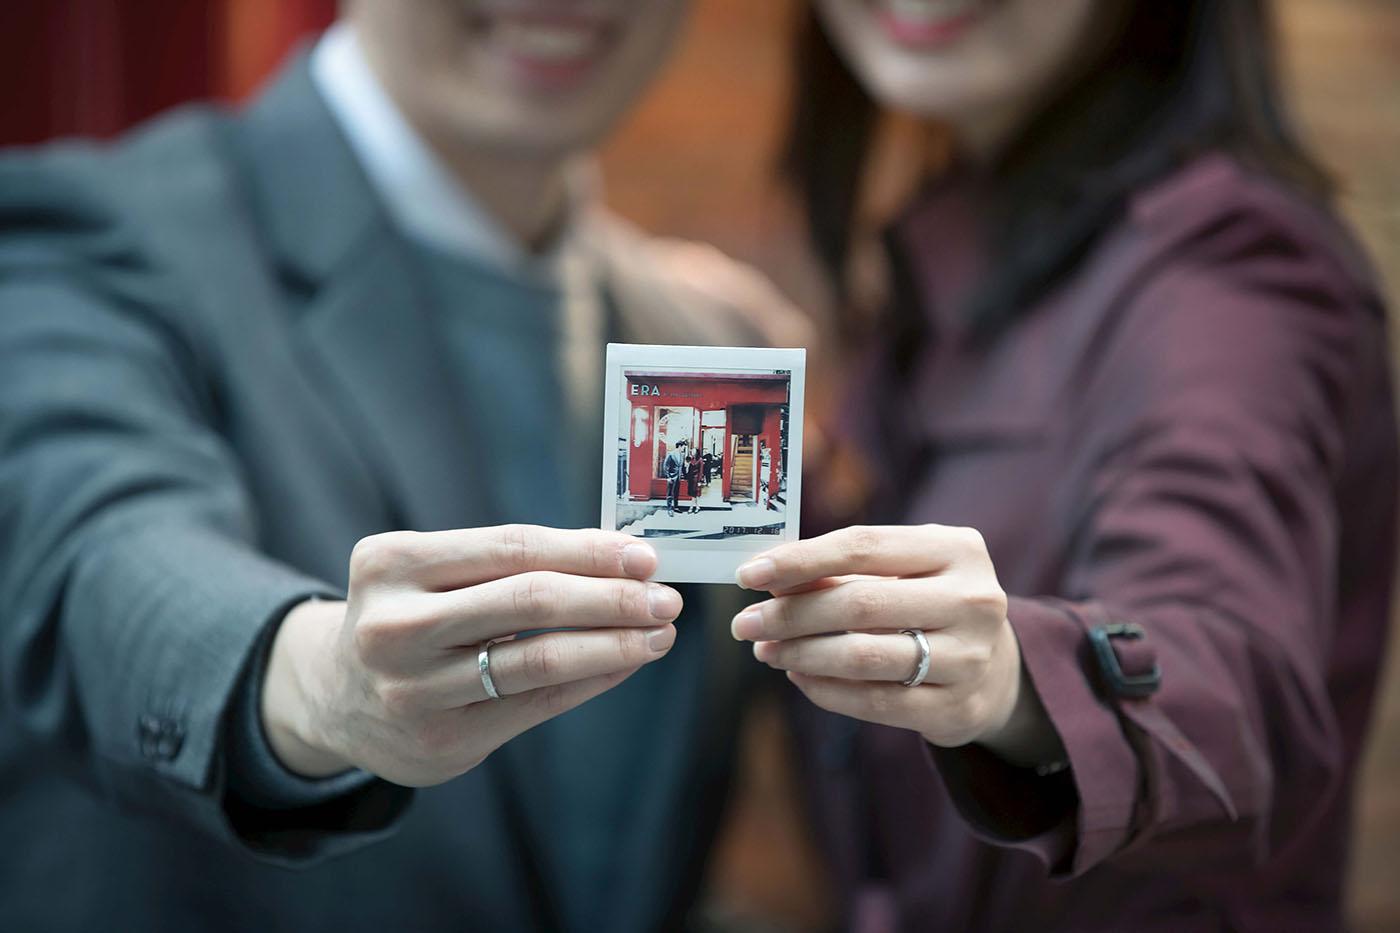 Sprazzi_Professional_Portrait_Photo_Hongkong_Kevin_Resize_17.jpg